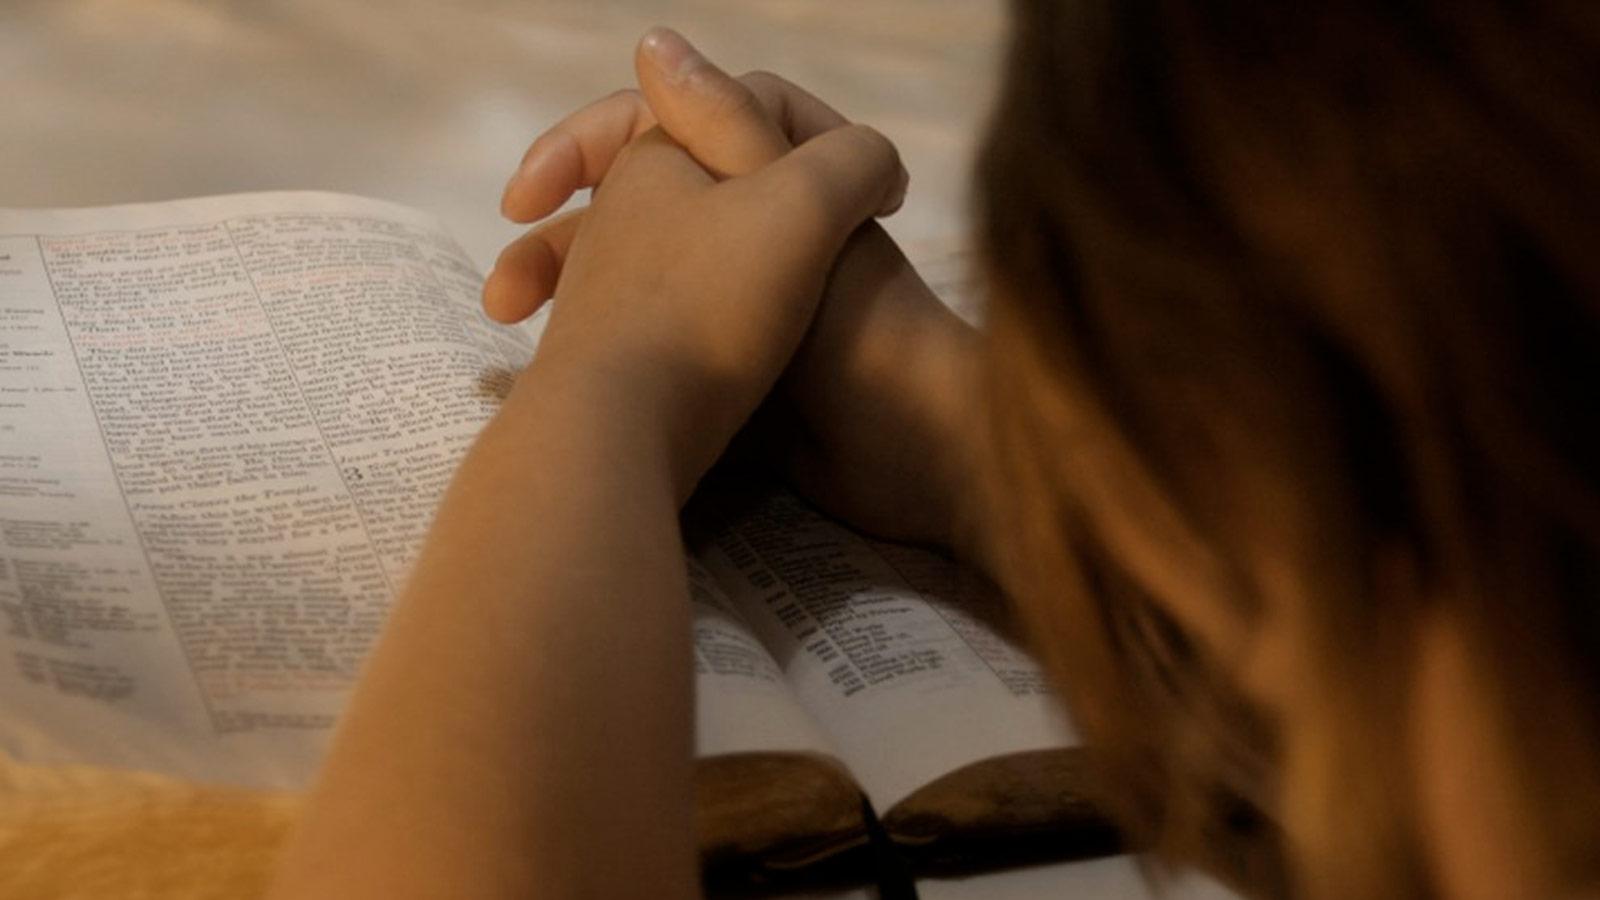 mujer-orar